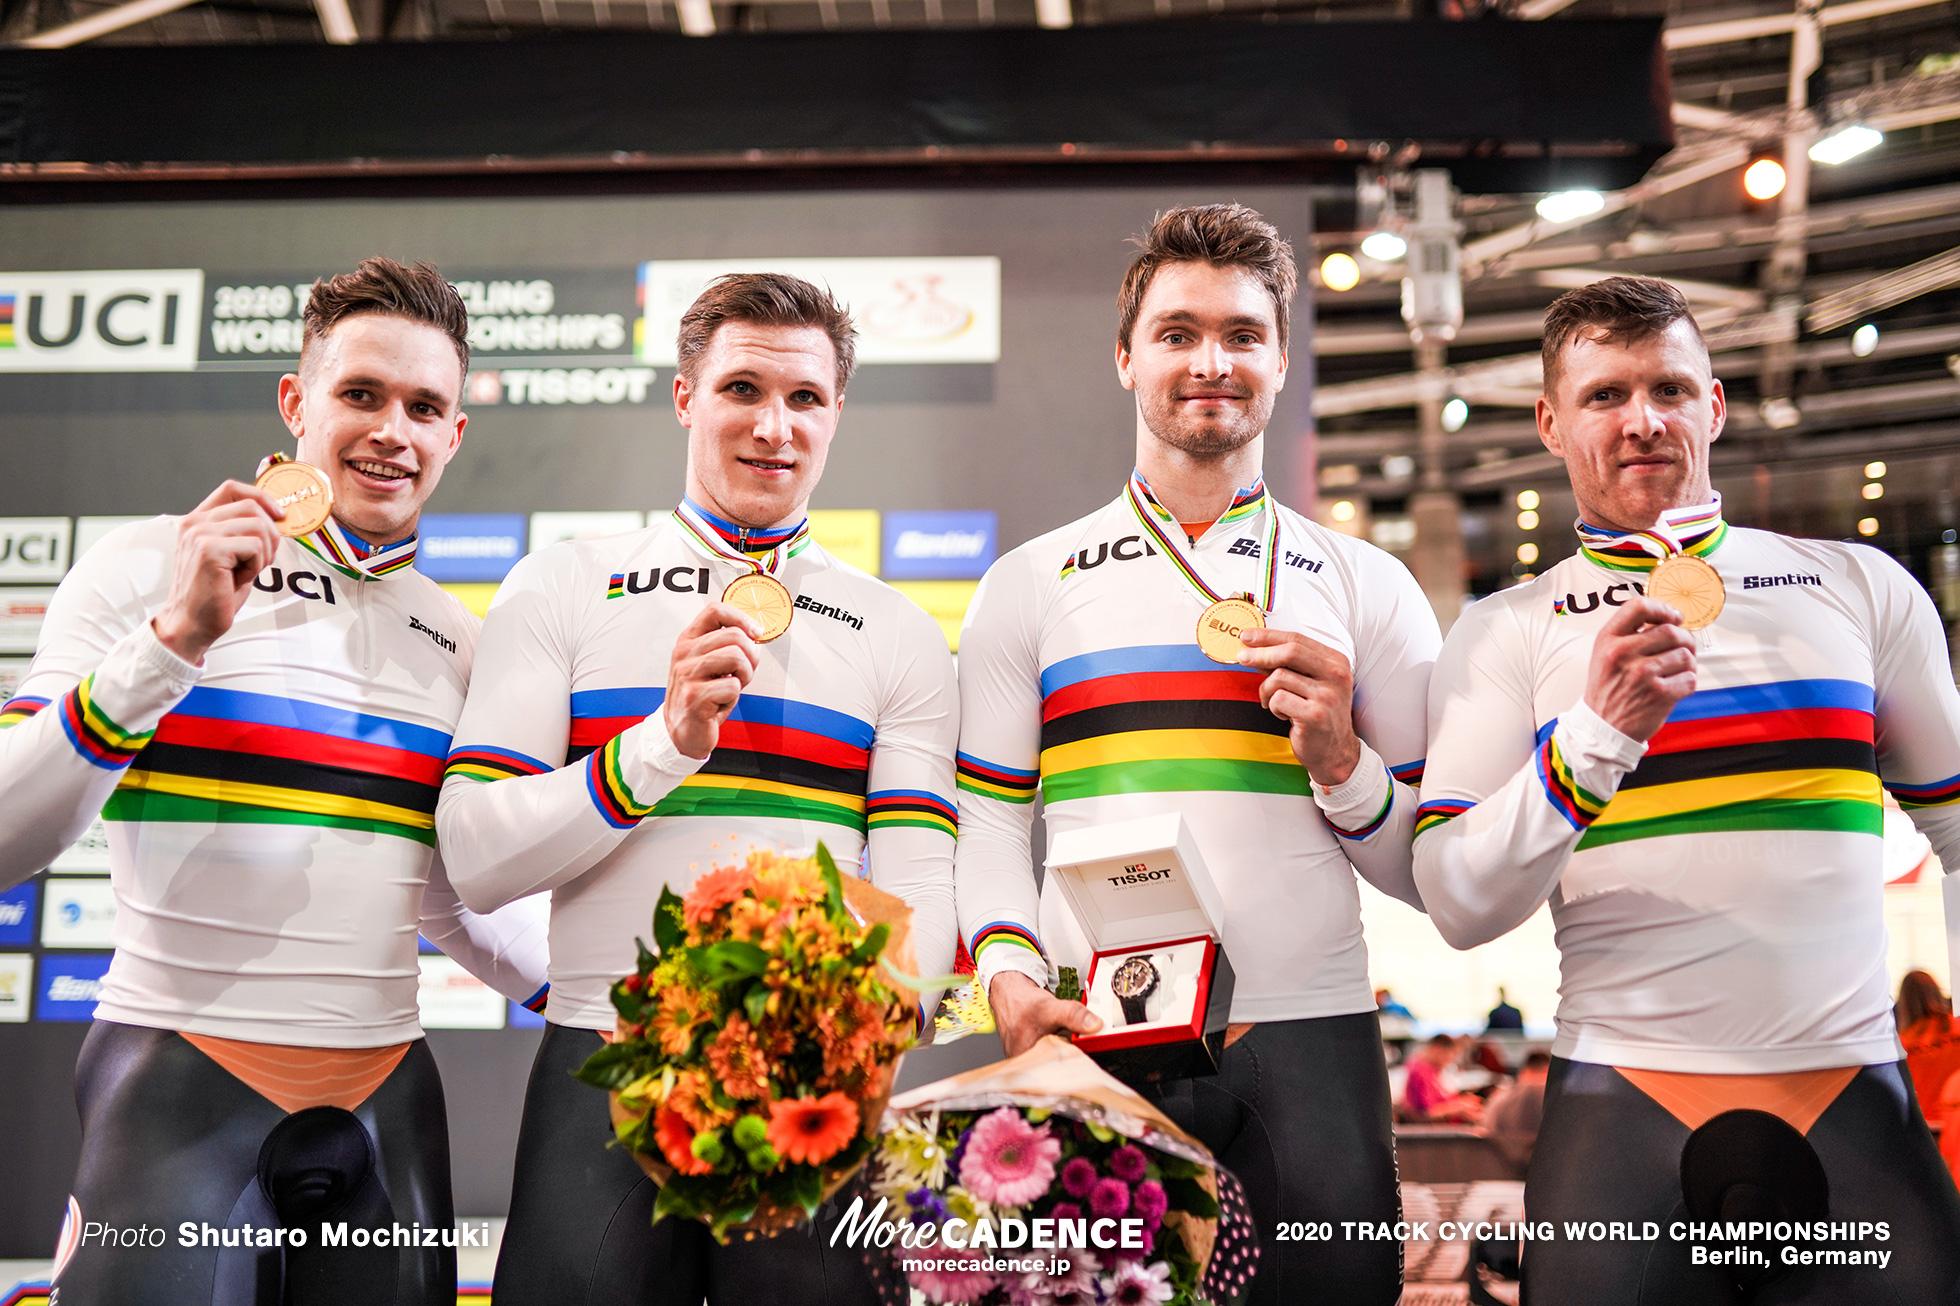 Final / Men's Team Sprint / 2020 Track Cycling World Championships /オランダ Netherlands/ ロイ・バンデンバーグ Roy van den Berg, ハリー・ラブレイセン Harrie Lavreysen, ジェフリー・ホーフラント Jeffrey Hoogland, マティエス・ブフリ Matthijs Buchli